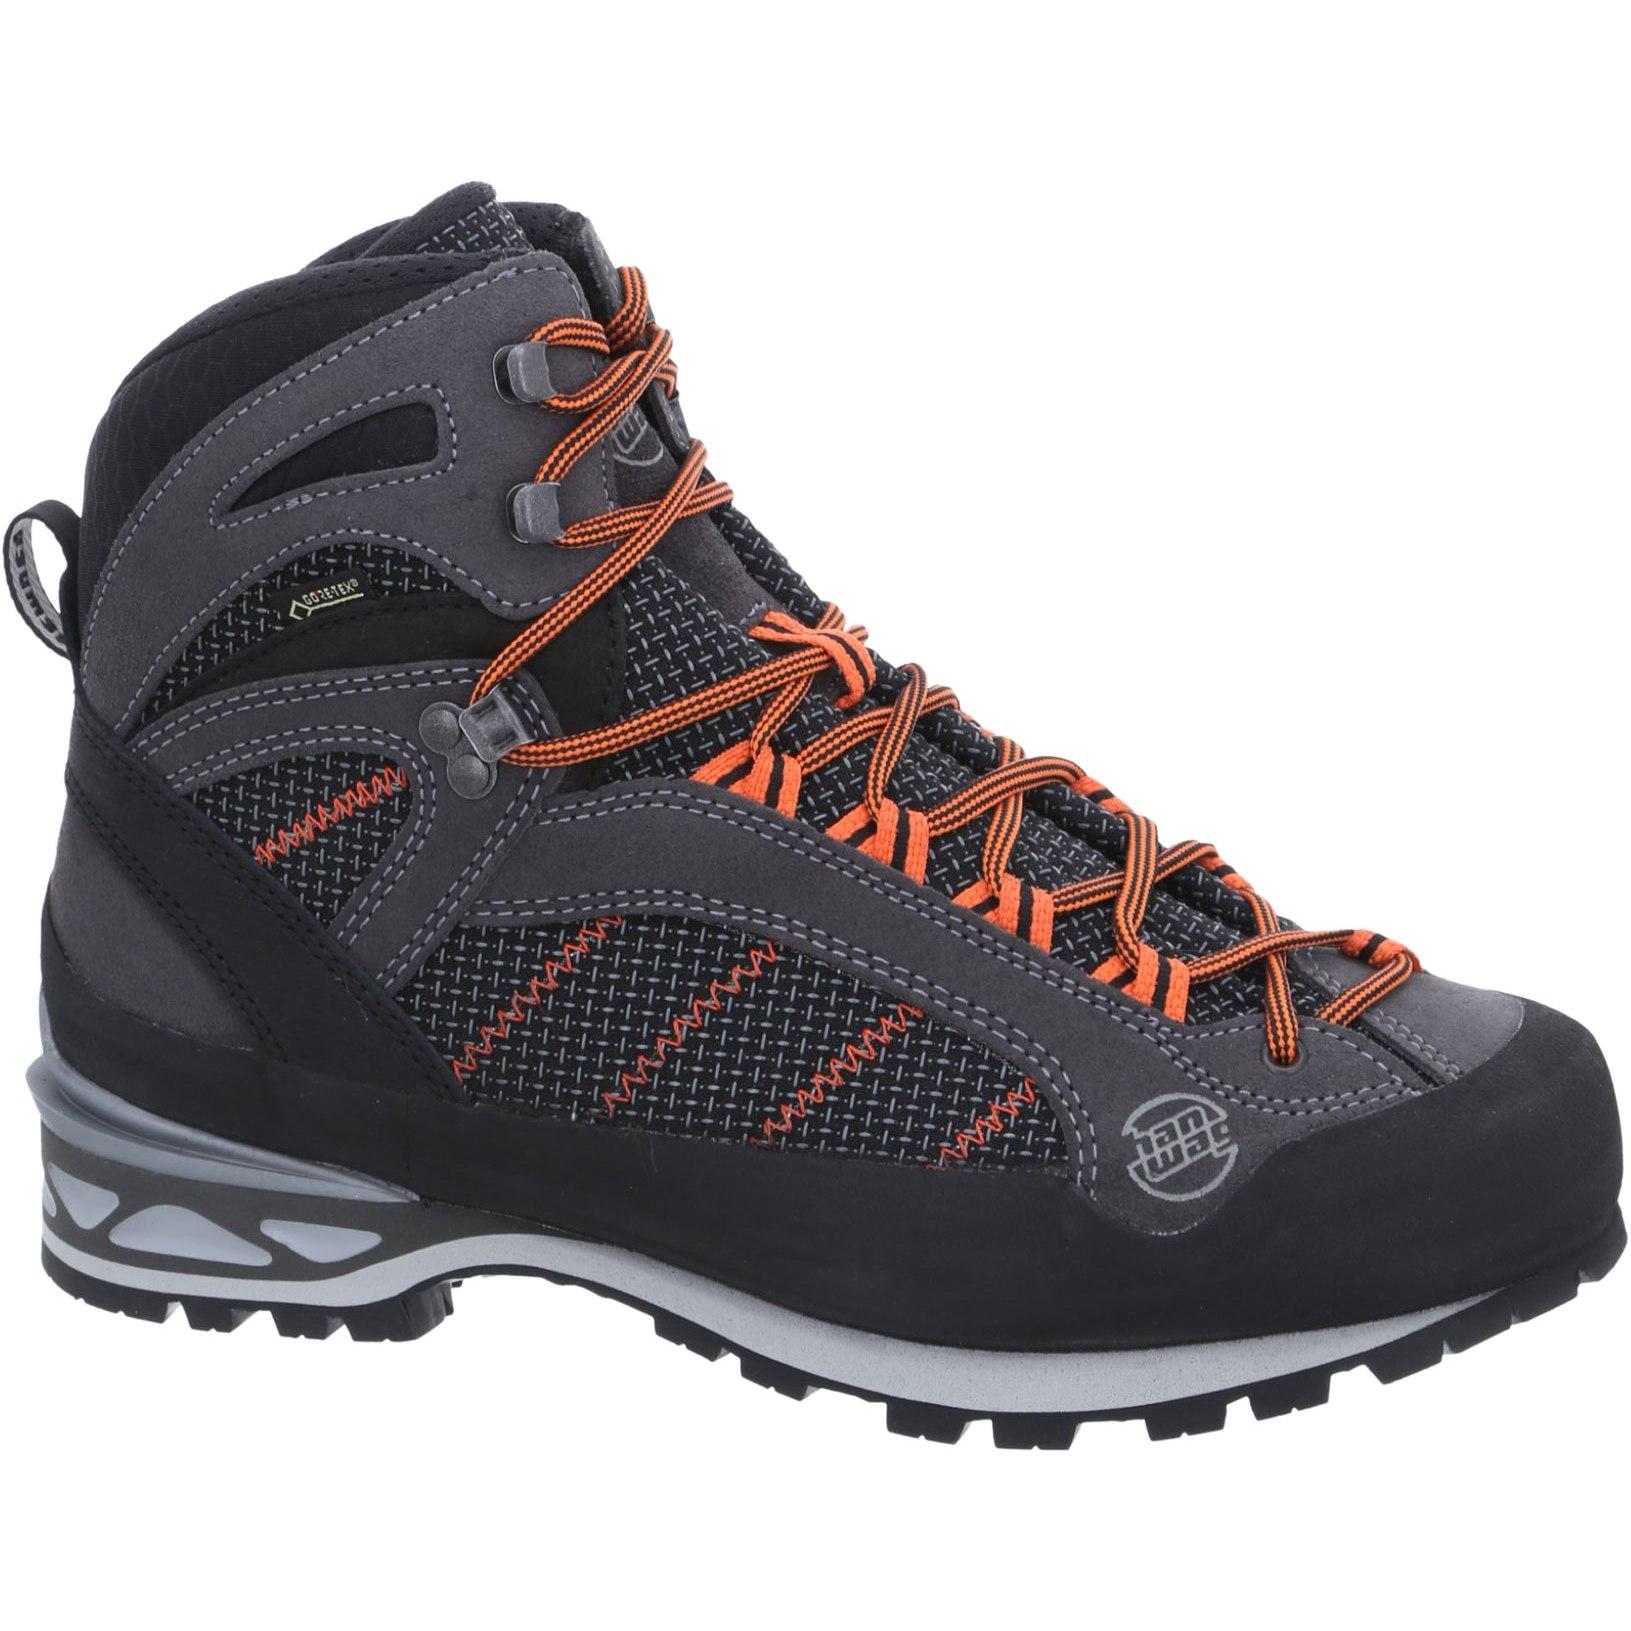 Hanwag Makra Combi GTX Shoe - Asphalt/Orange